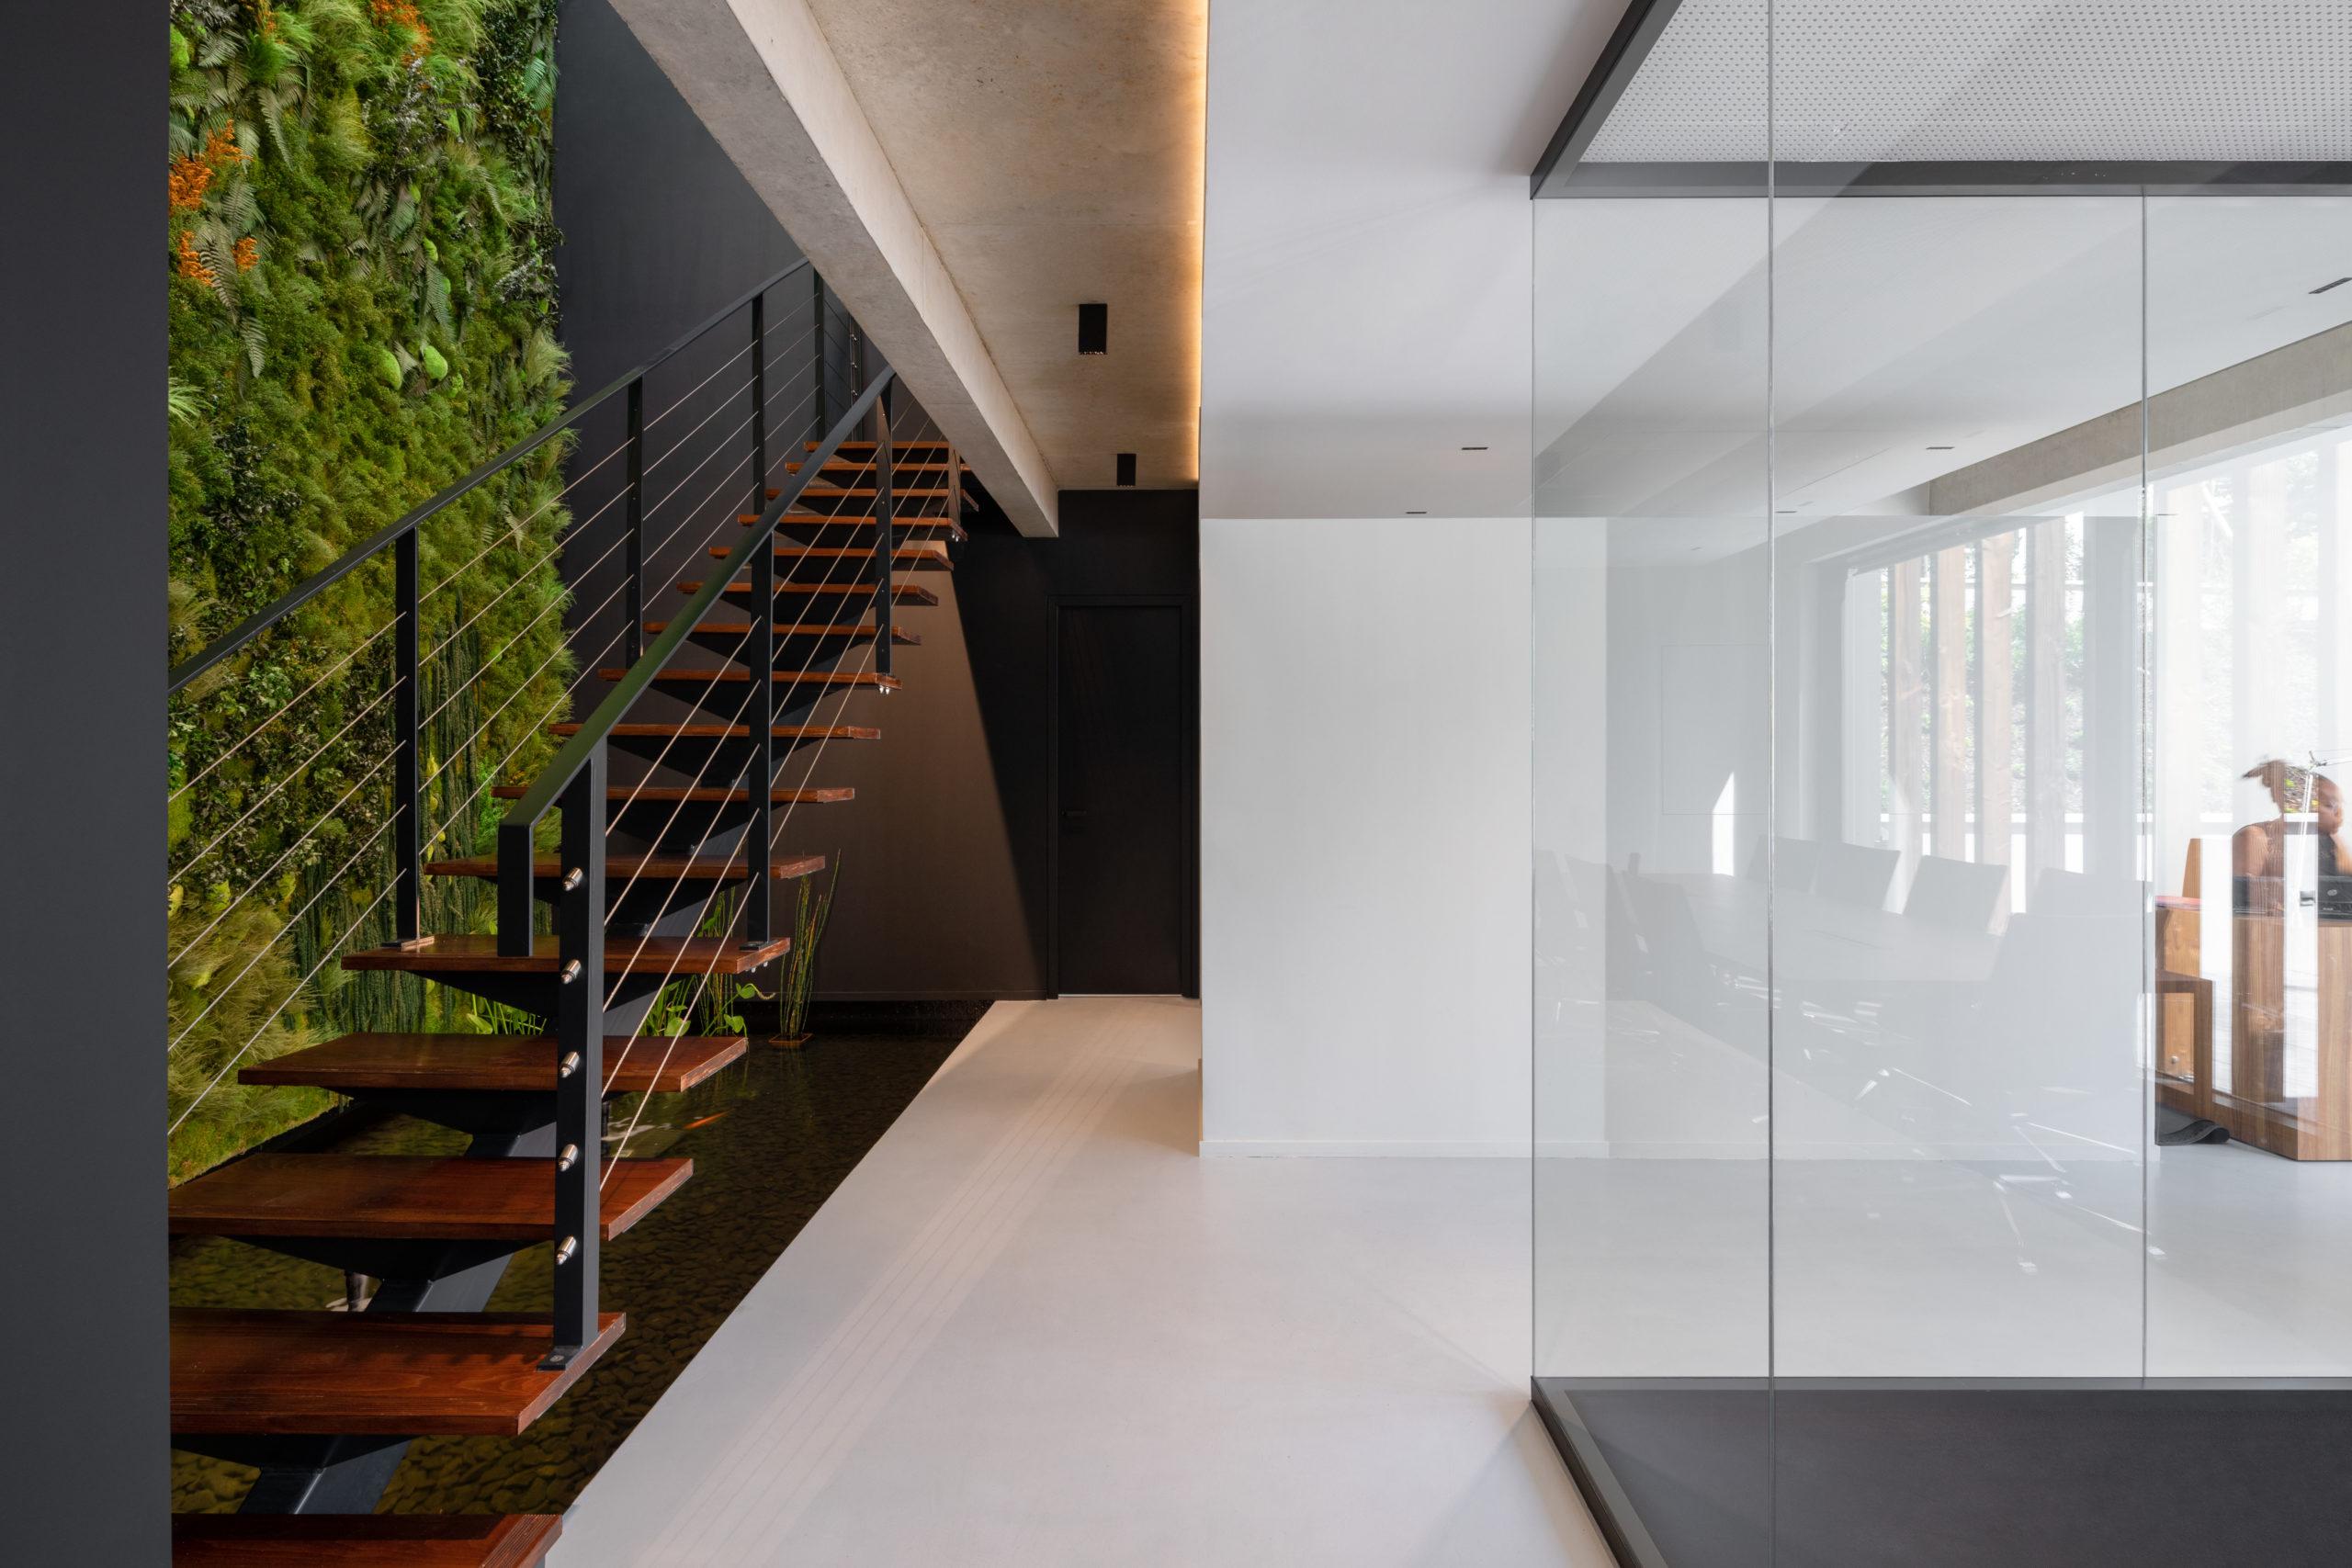 https://www.floordesign-resine.com/w2020/wp-content/uploads/2021/08/FLOORDESIGN-béton-ciré-103-scaled.jpg